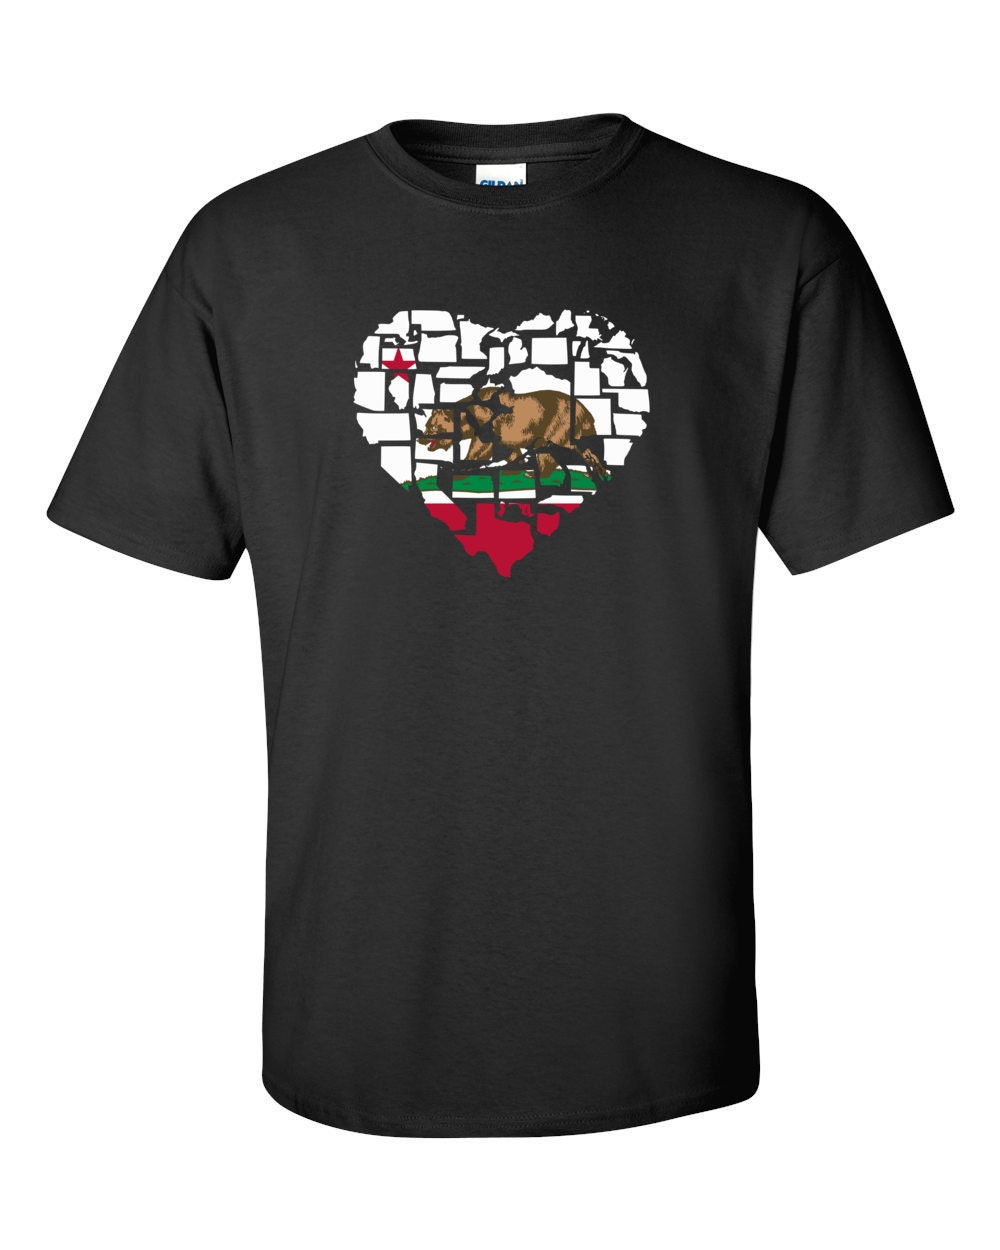 California T-shirt - No Matter Where I Am, California Is Alway In My Heart - My State California T-shirt